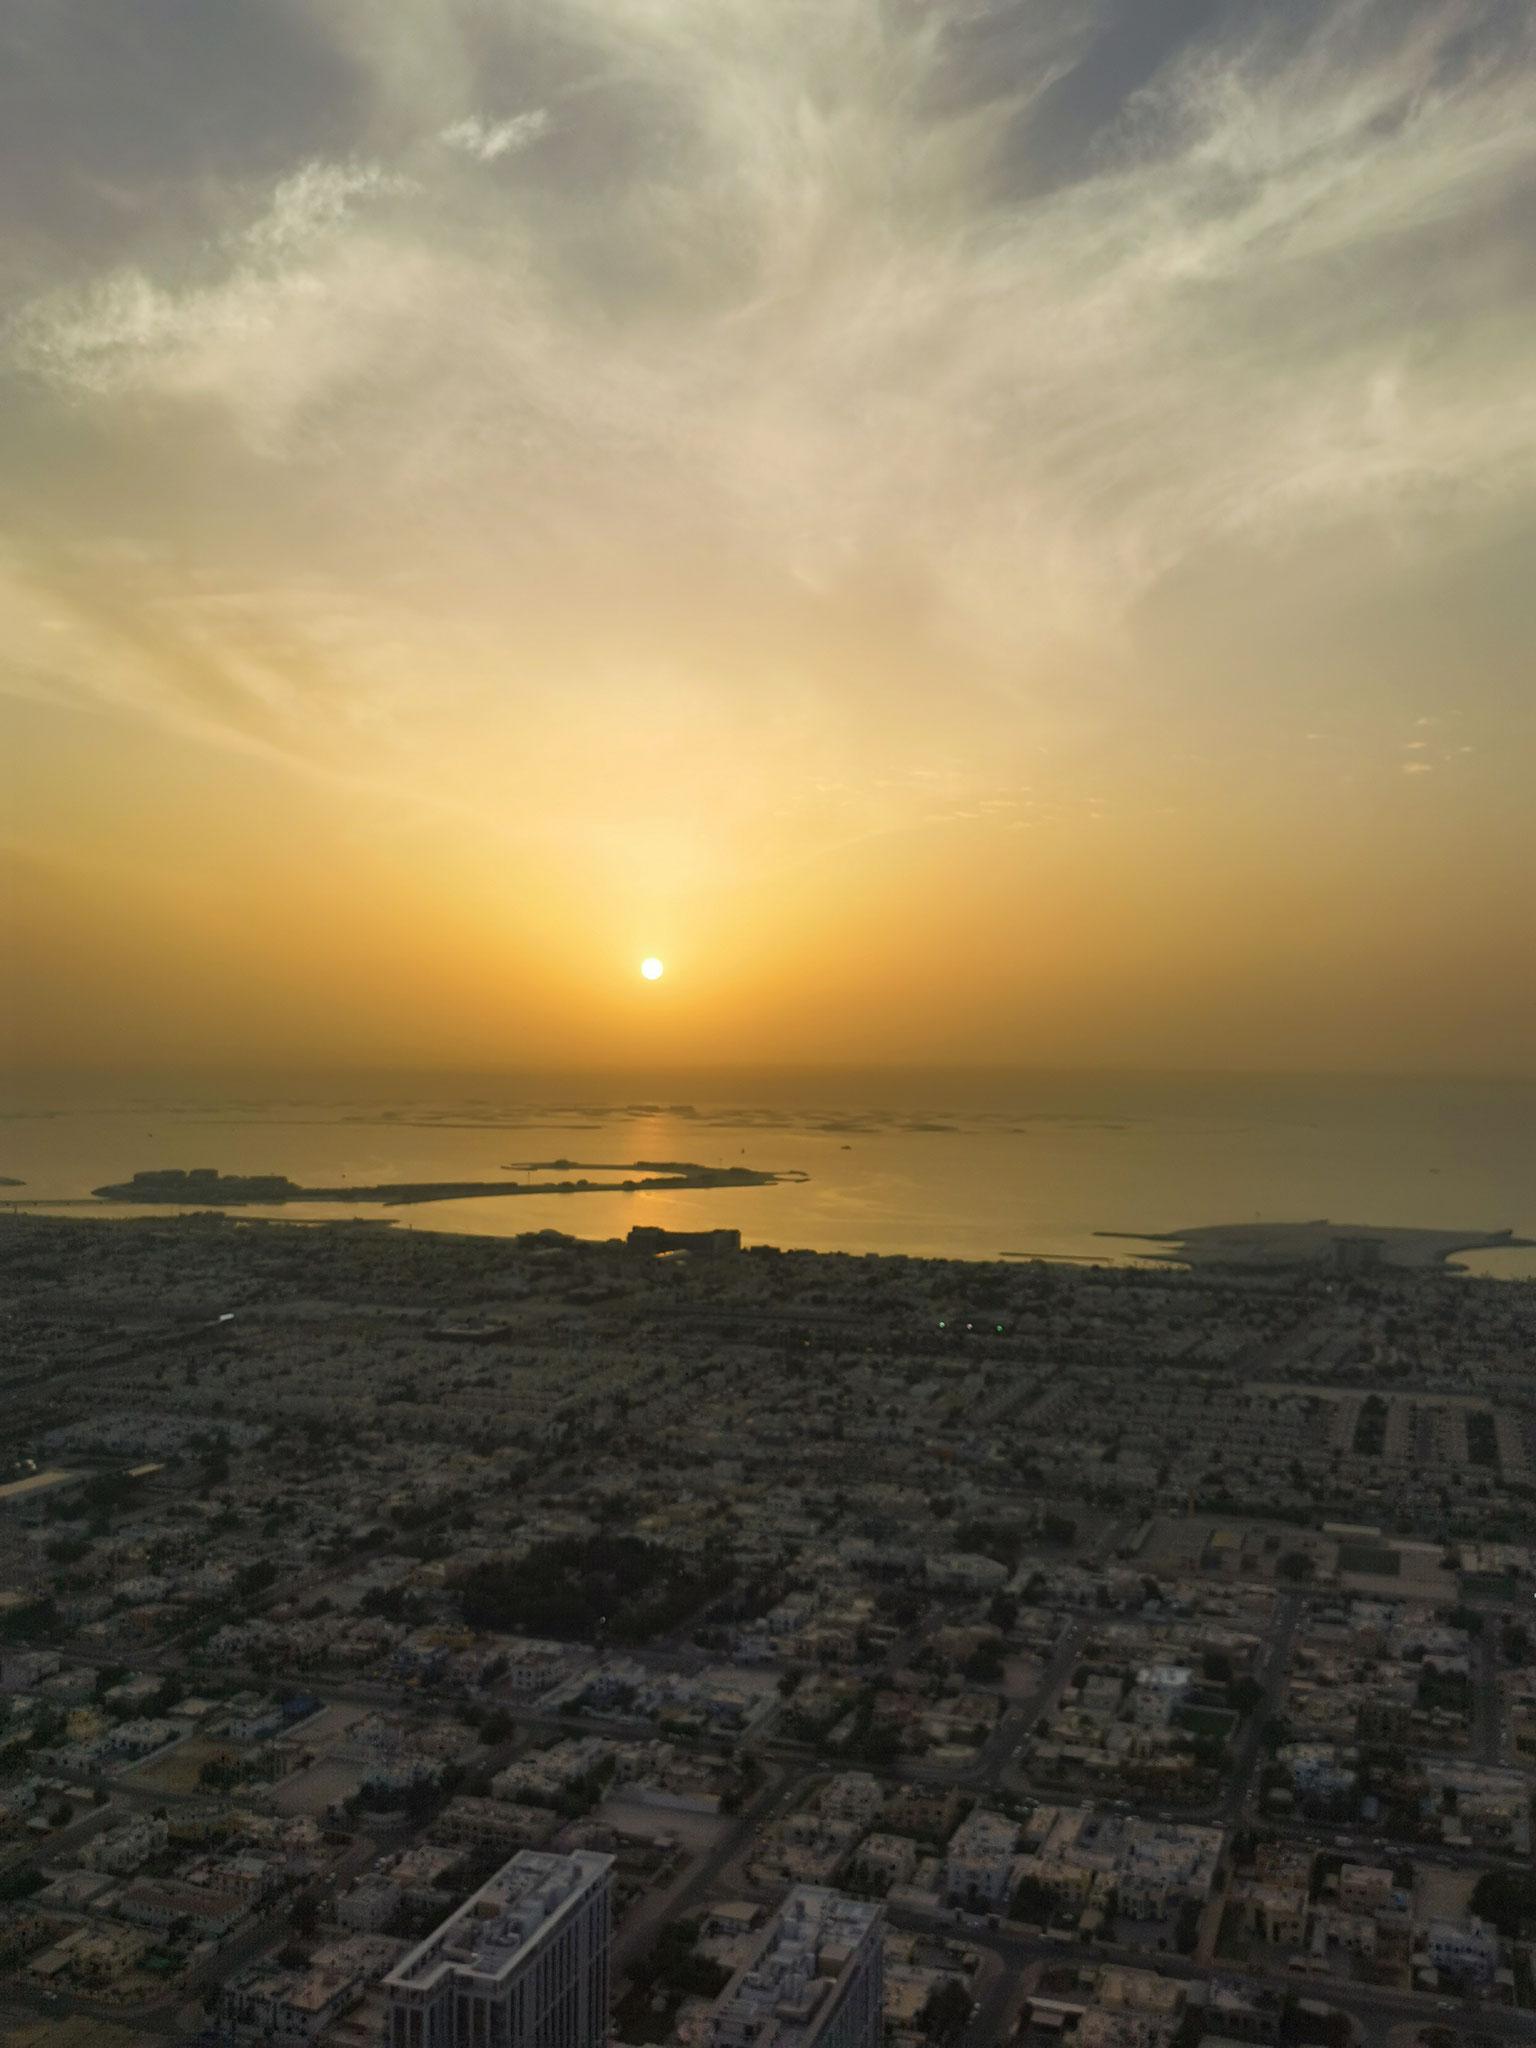 Aussicht zum Sonnenuntergang